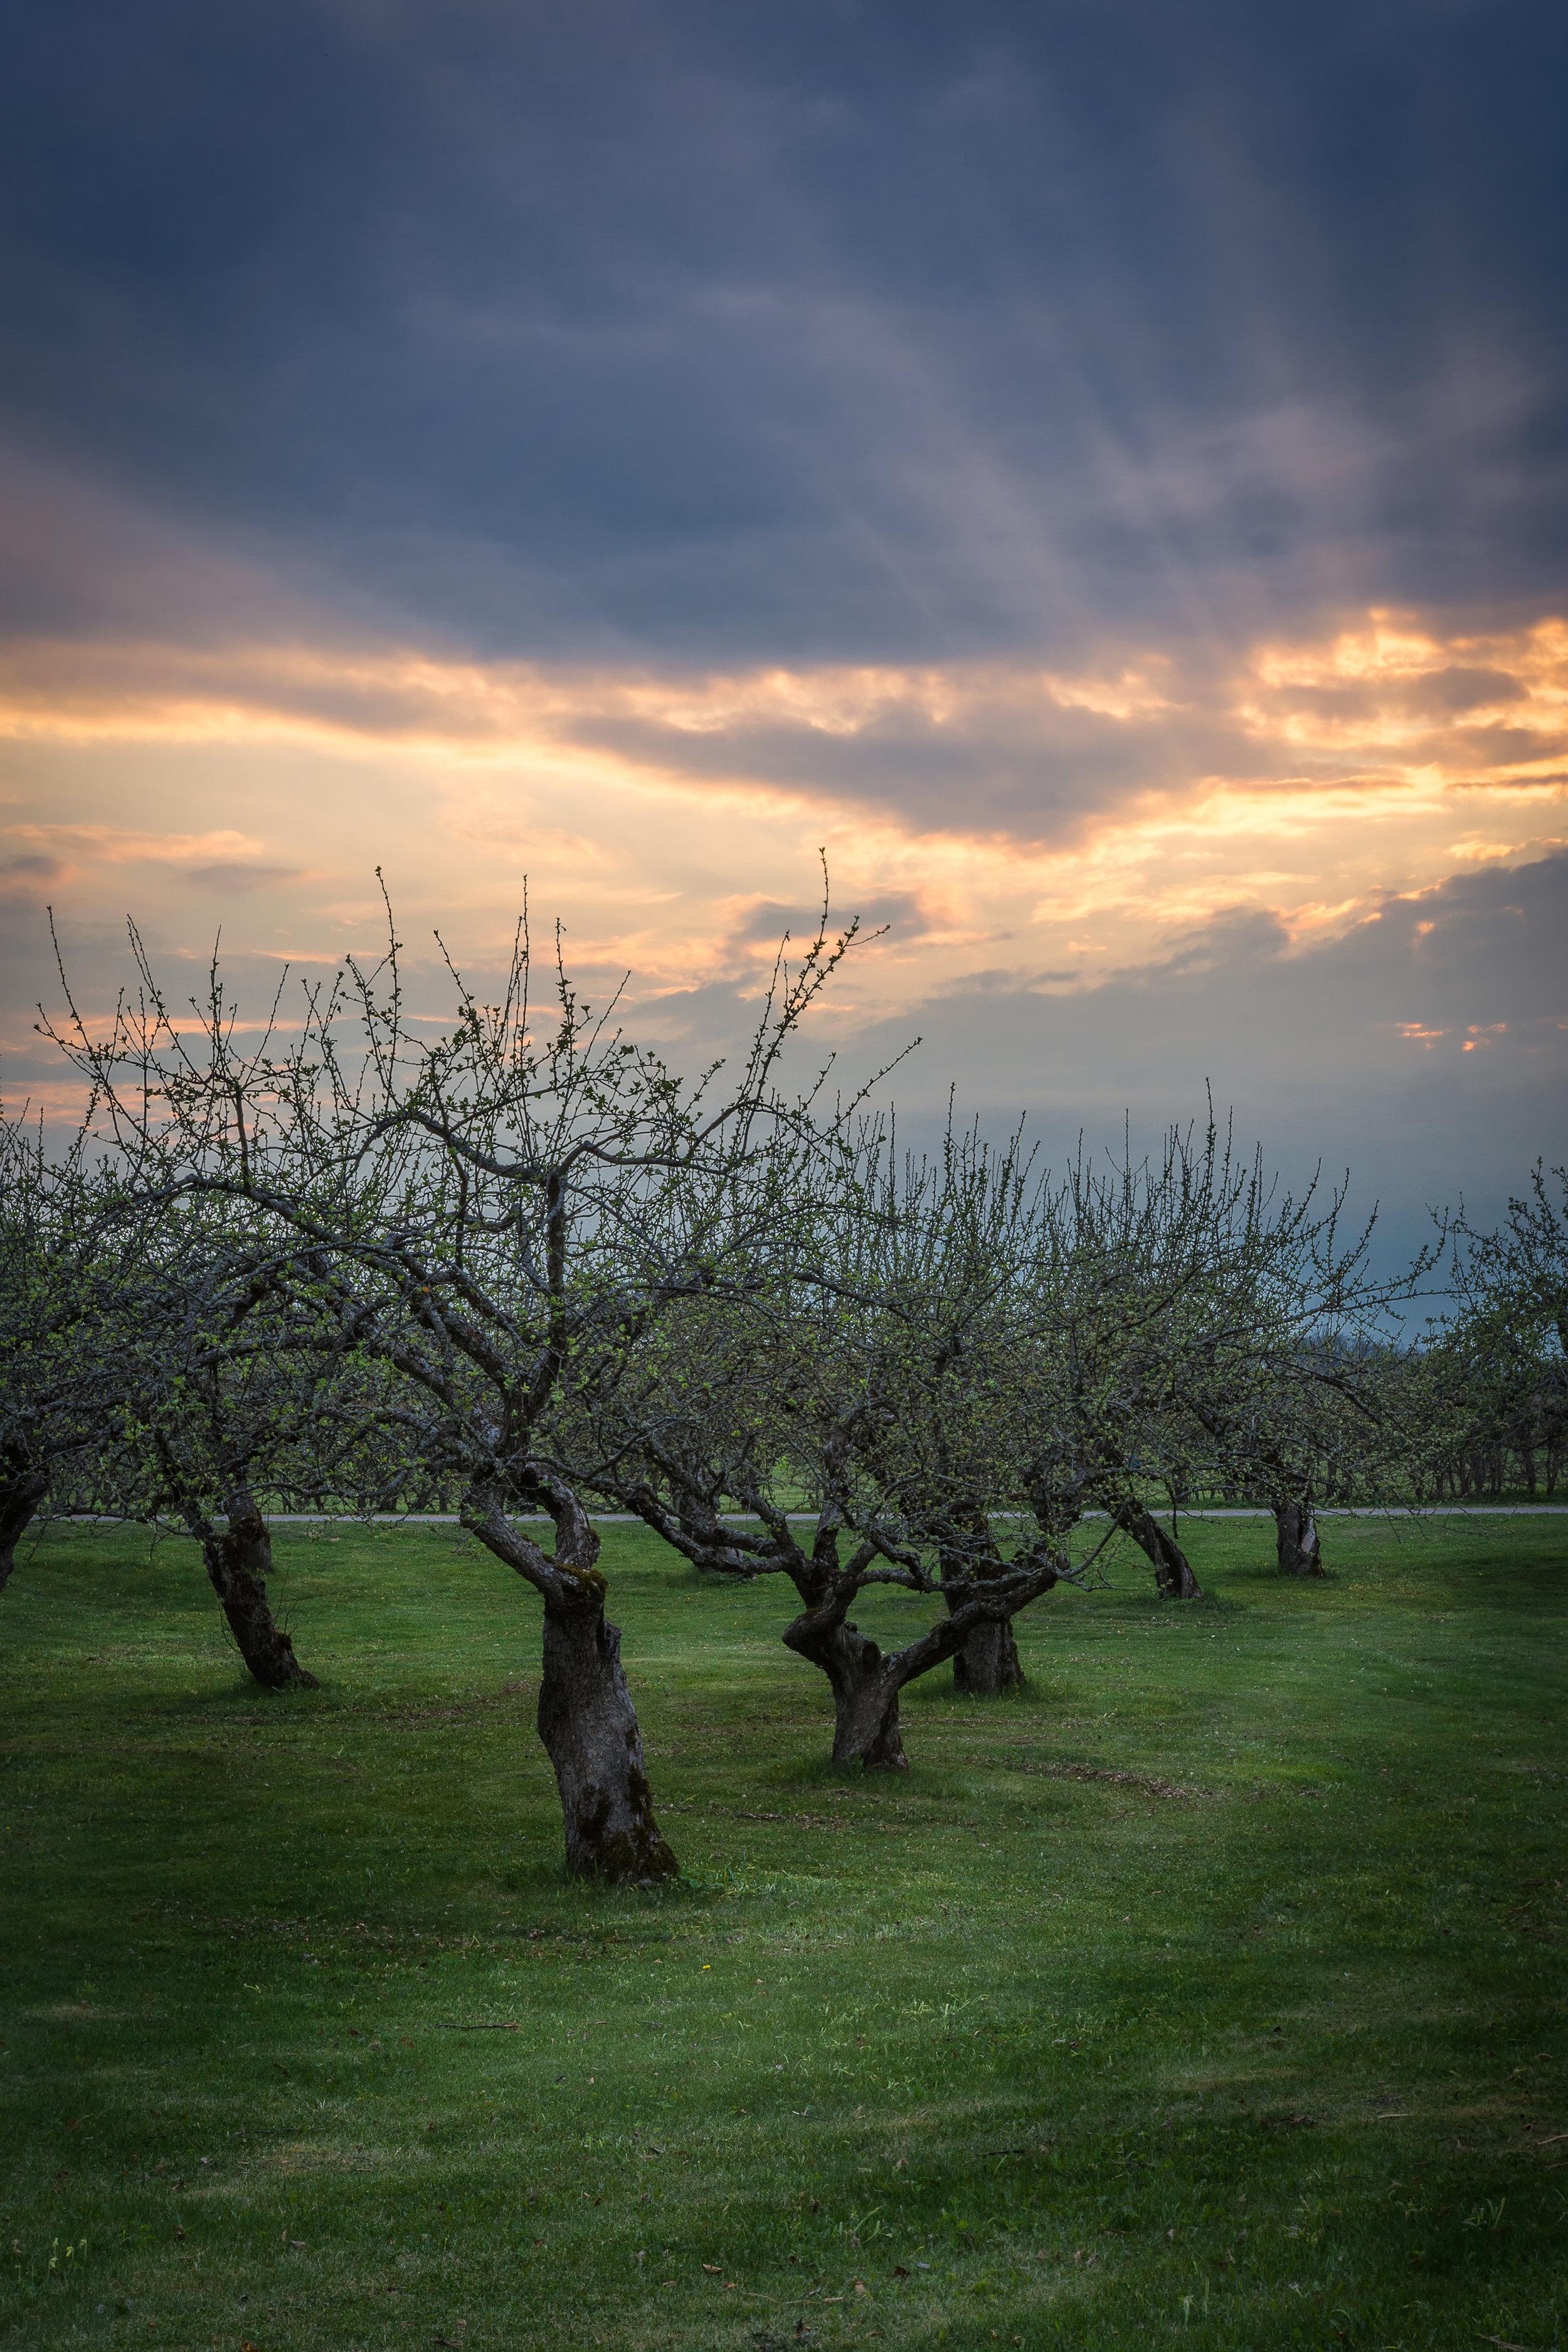 The apple tree parade